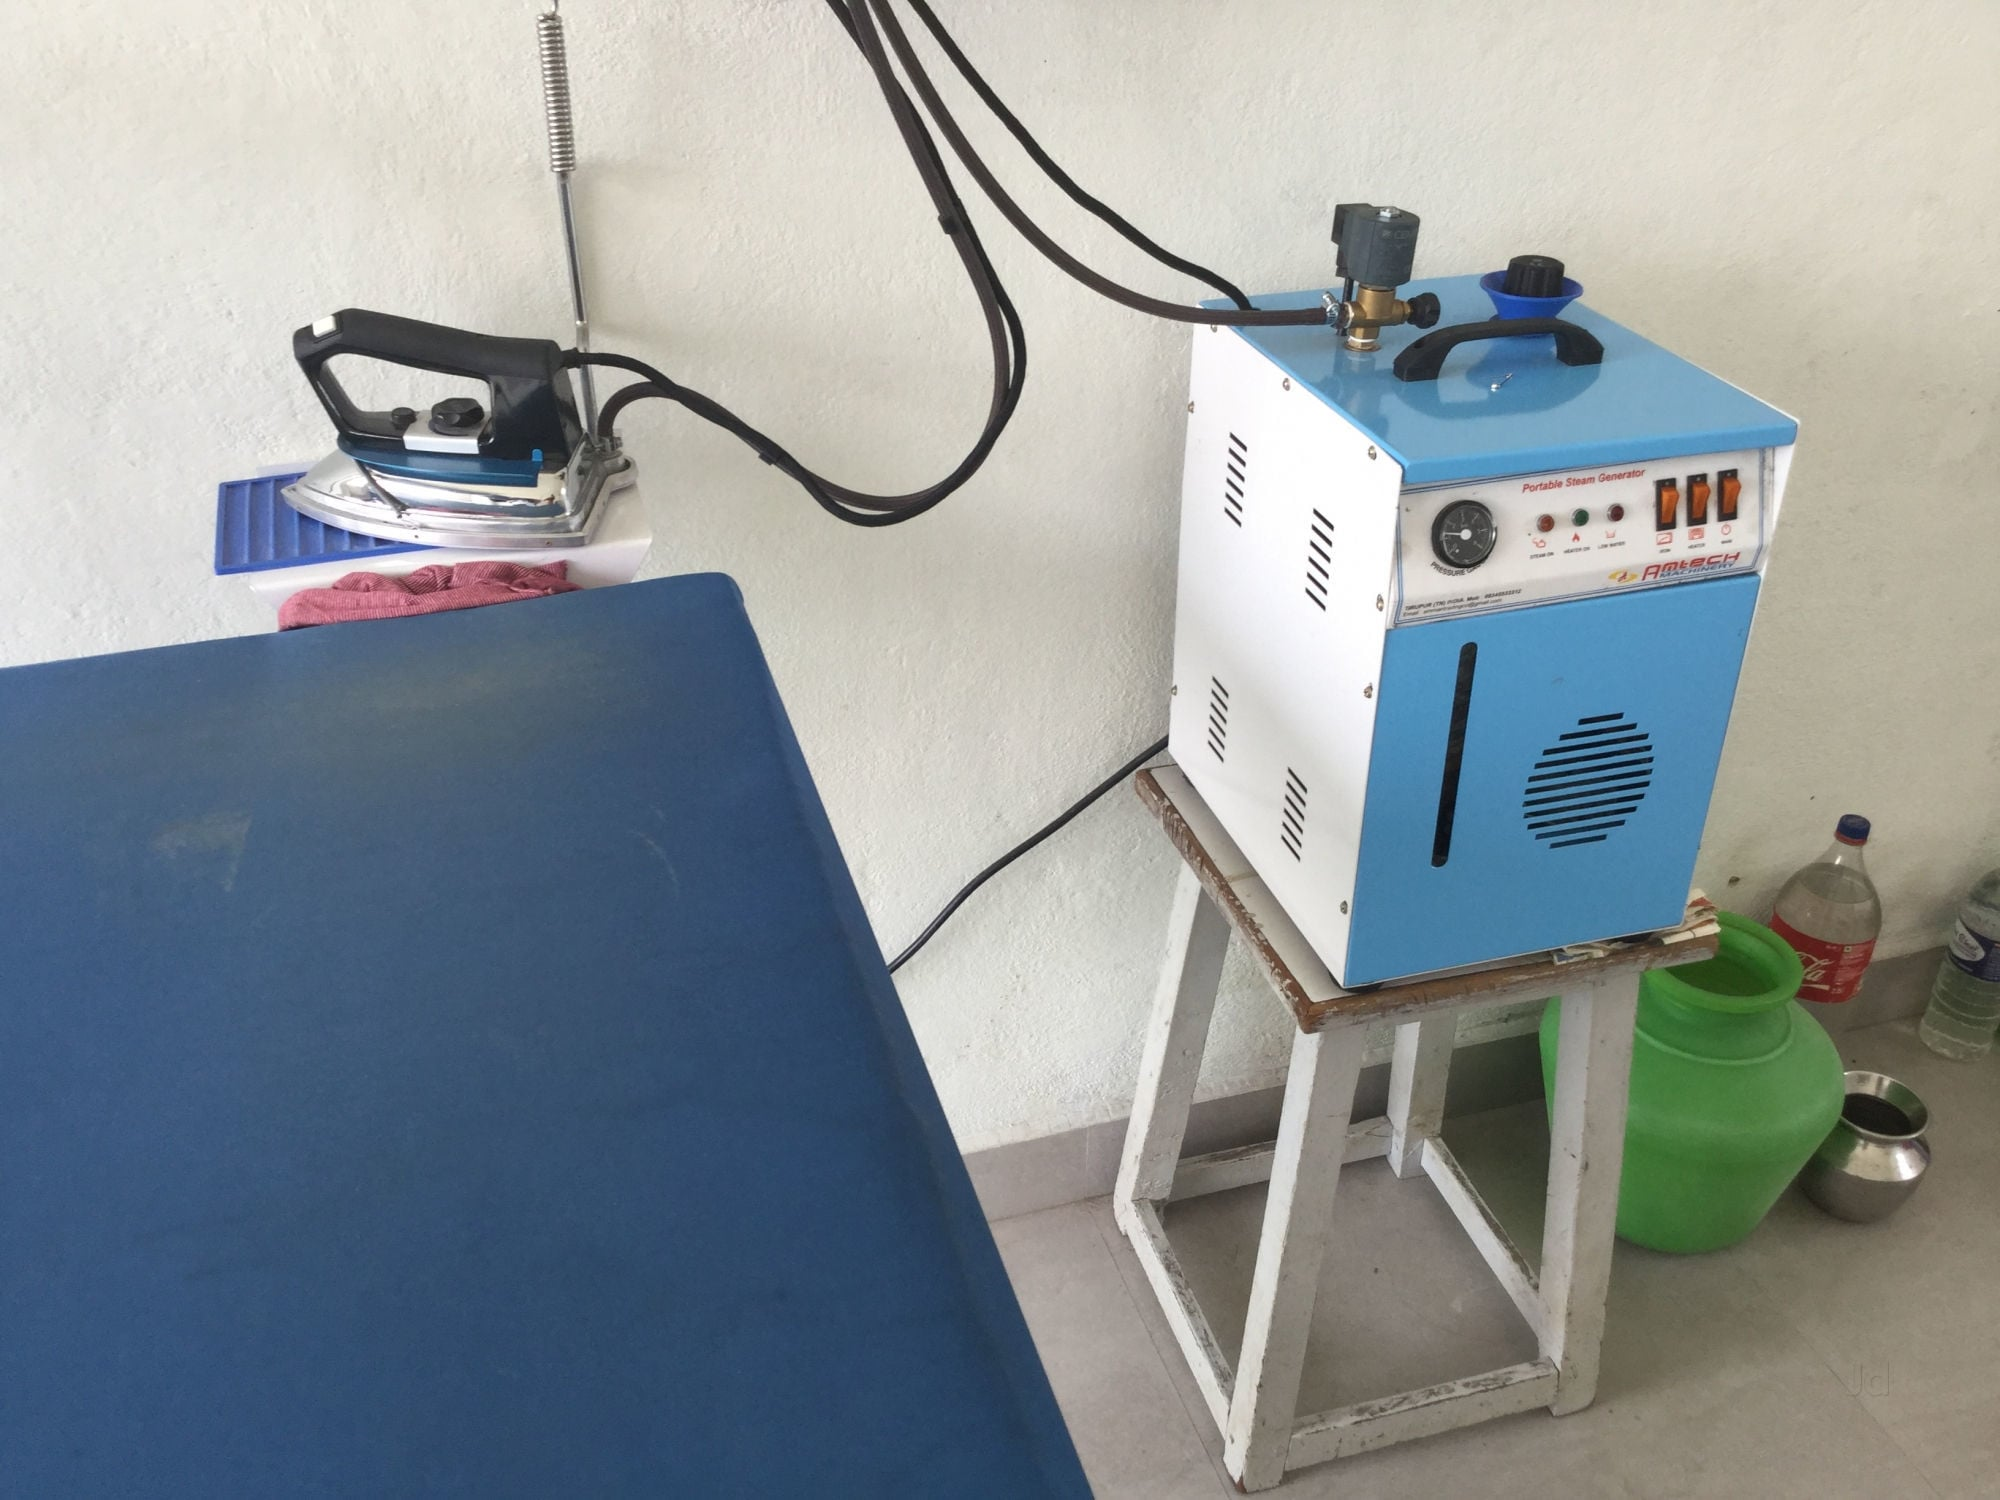 Bhagavathi Steam Ironing Kalapatti Laundry Services in